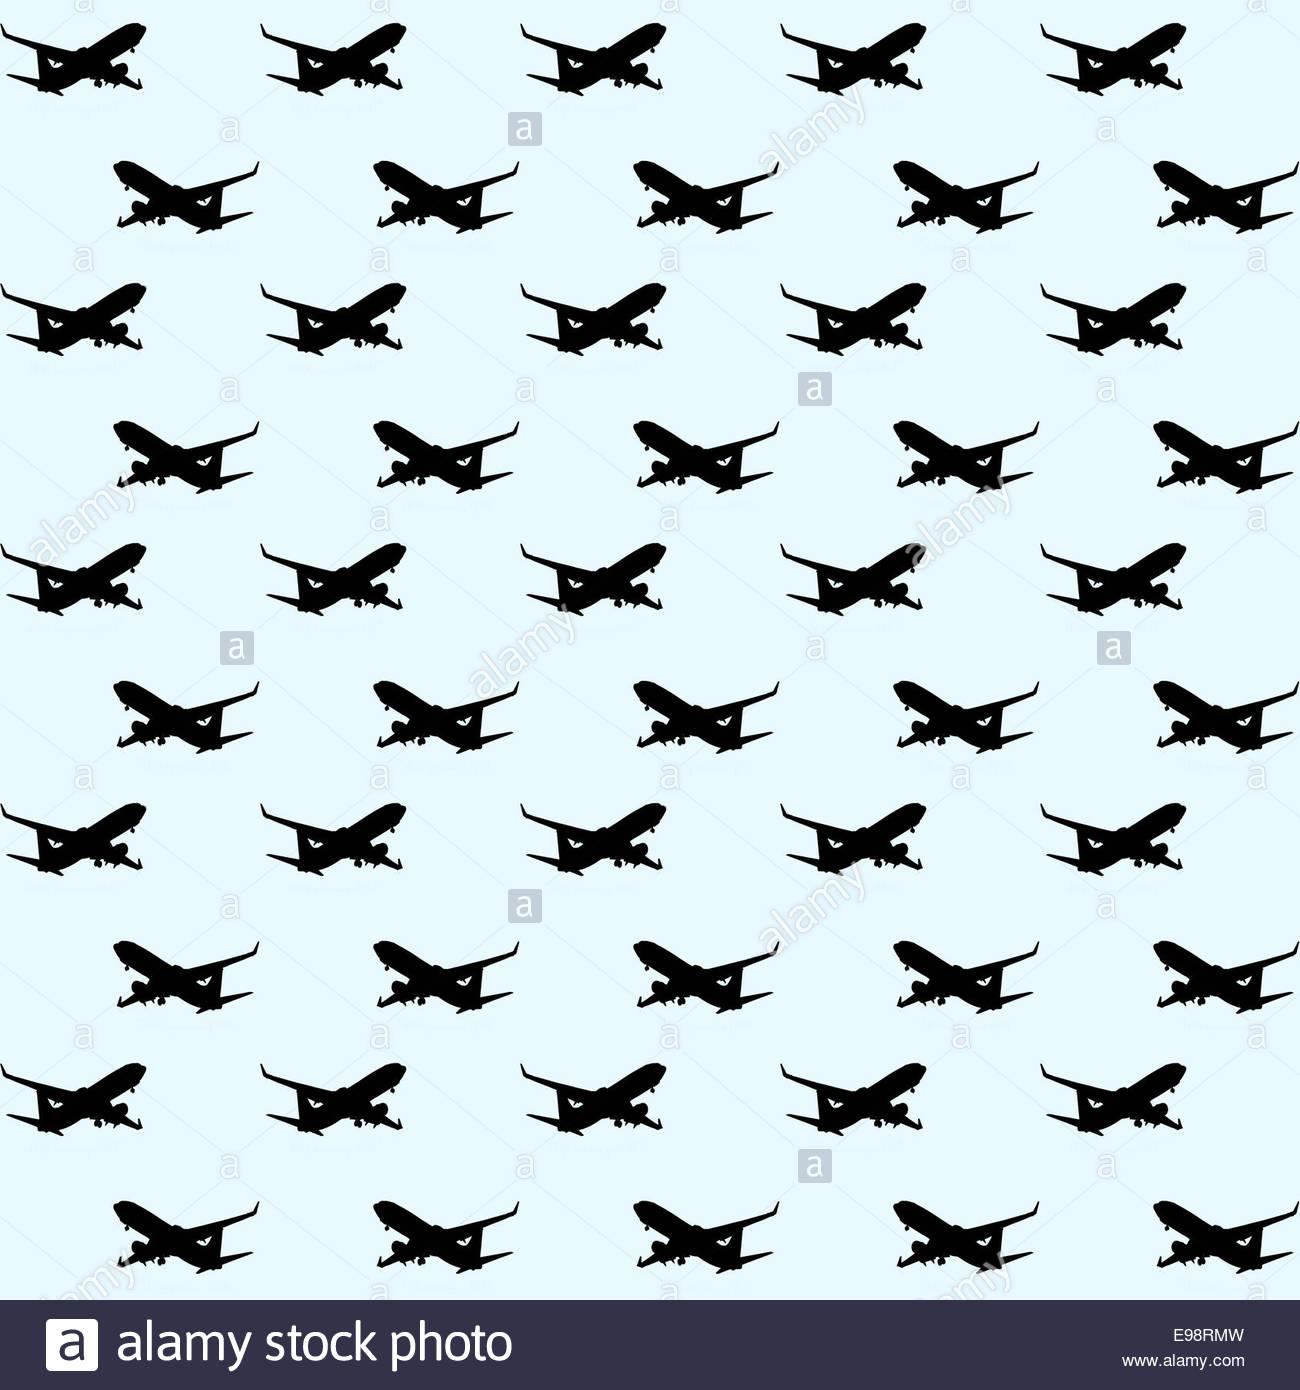 Digital illustration - concept - airliner wallpaper - Stock Image